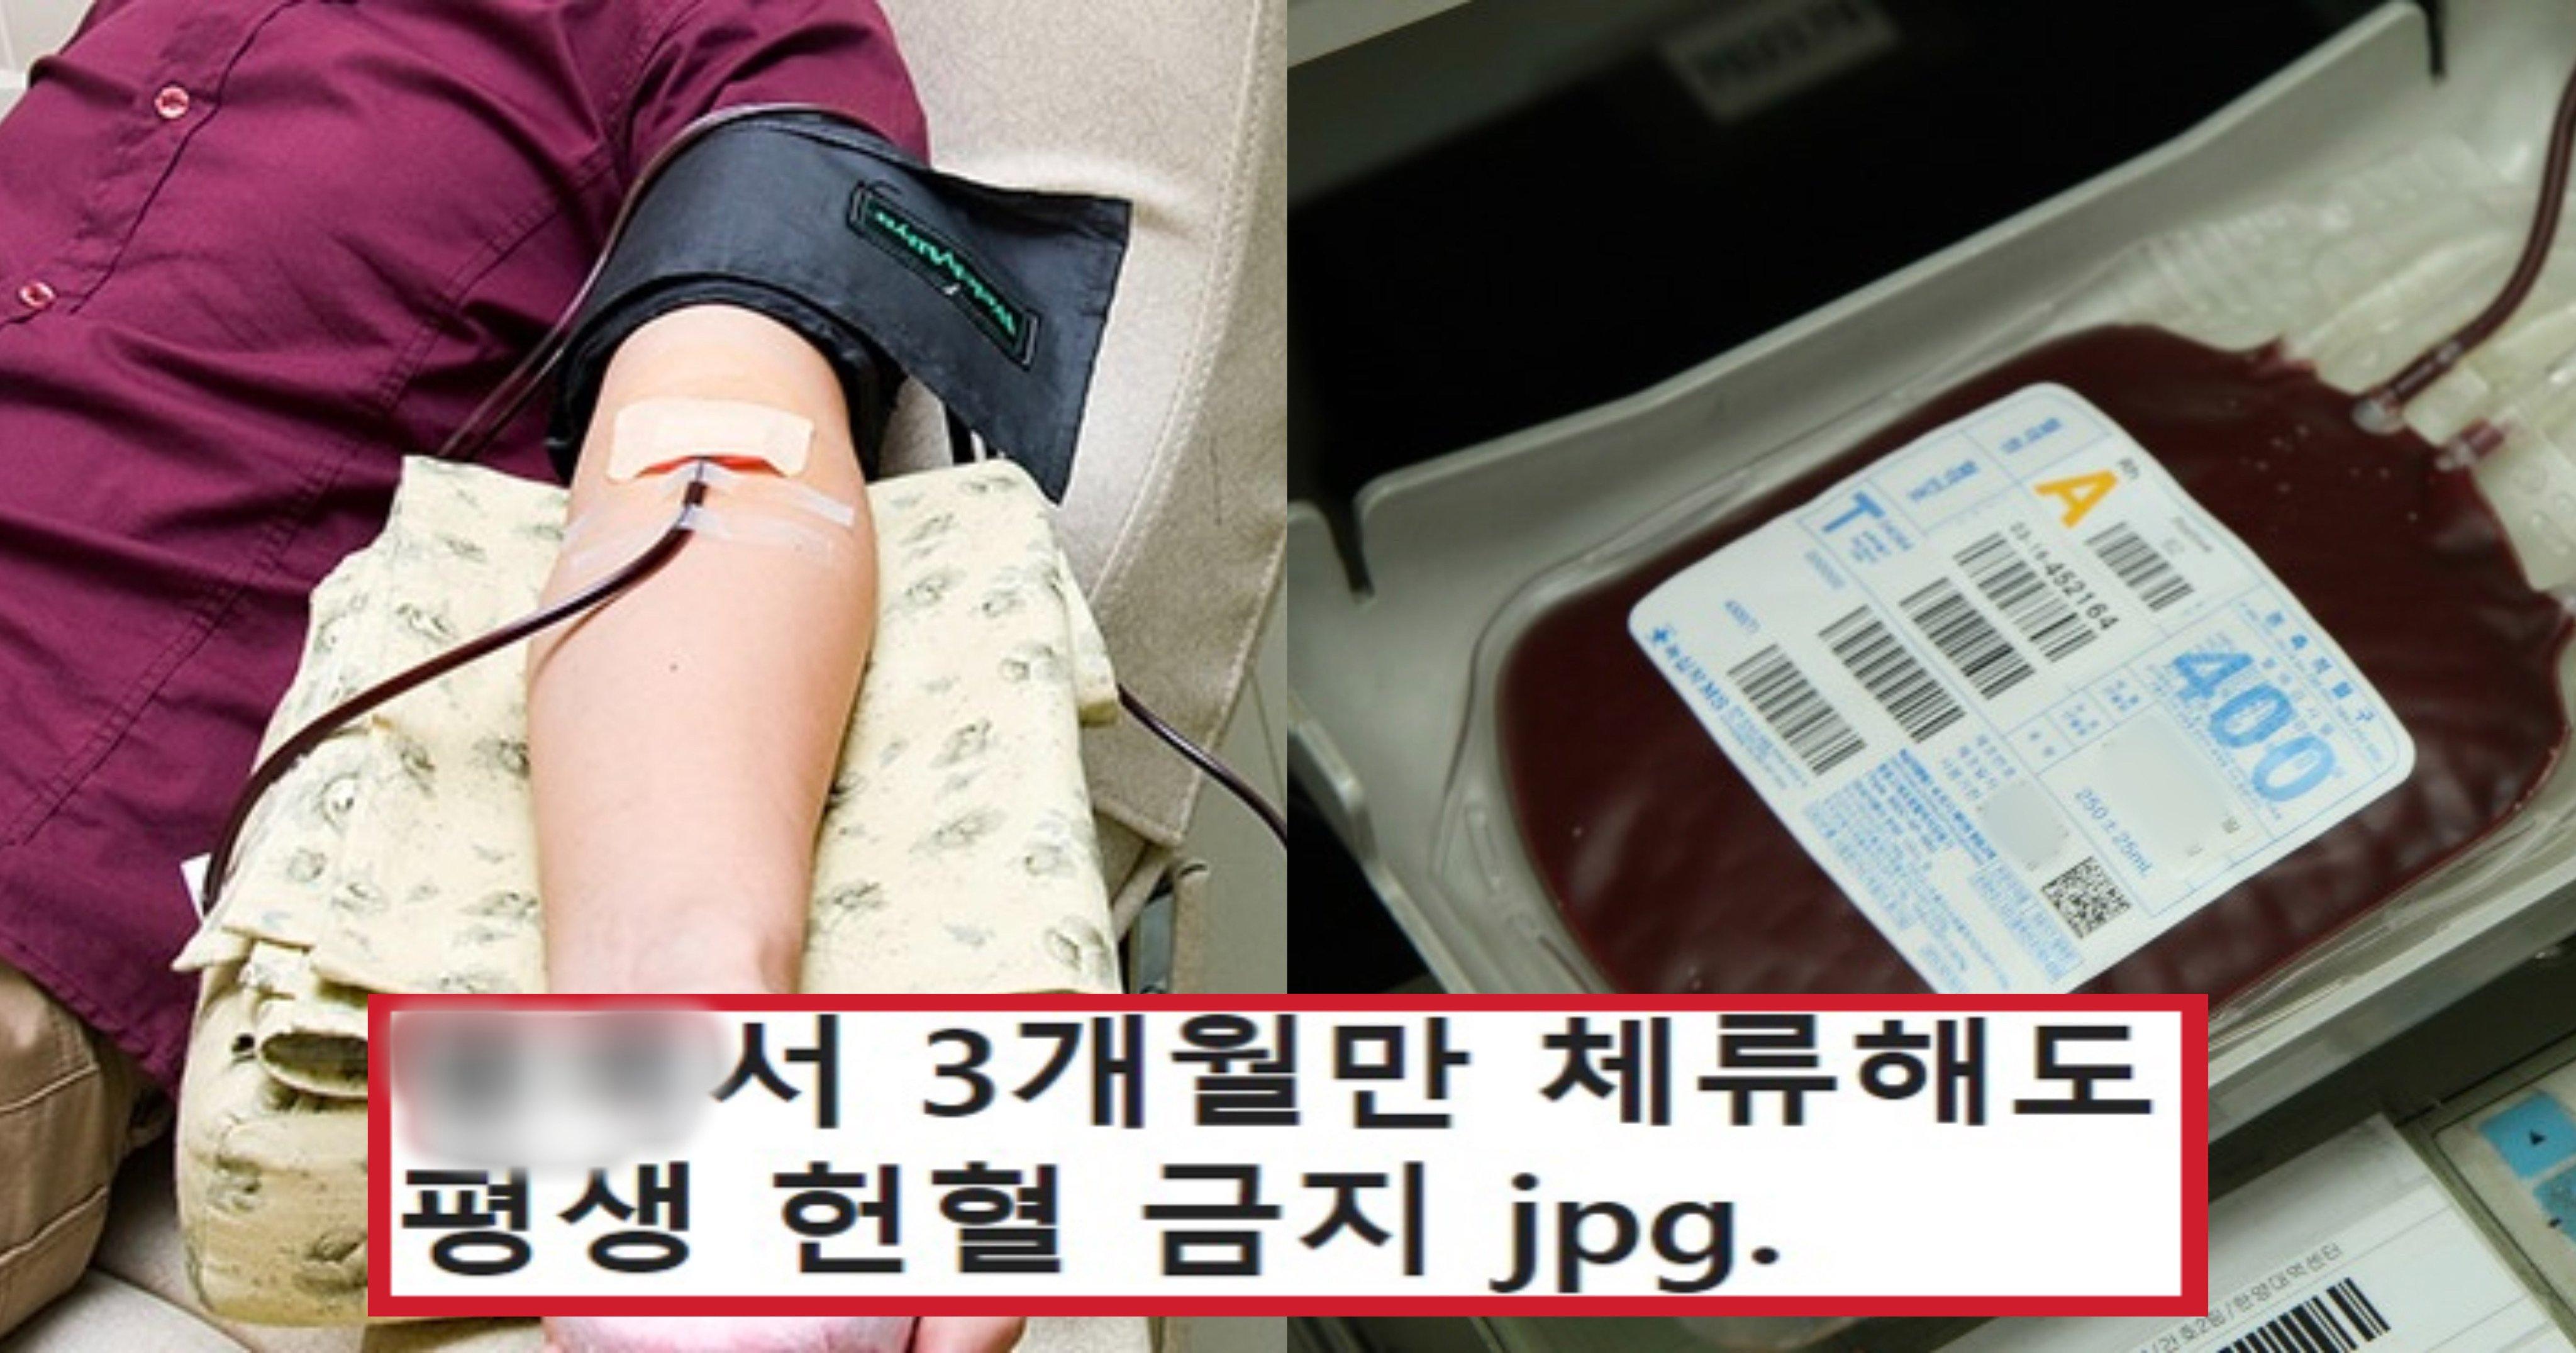 "364fb8a9 0e01 4749 889b 708b997faa99.jpeg?resize=412,232 - ""이 사람들은 헌혈 금지입니다""..'이곳'에 3개월만 체류해도 평생 헌혈 금지인 '충격적인' 이유"